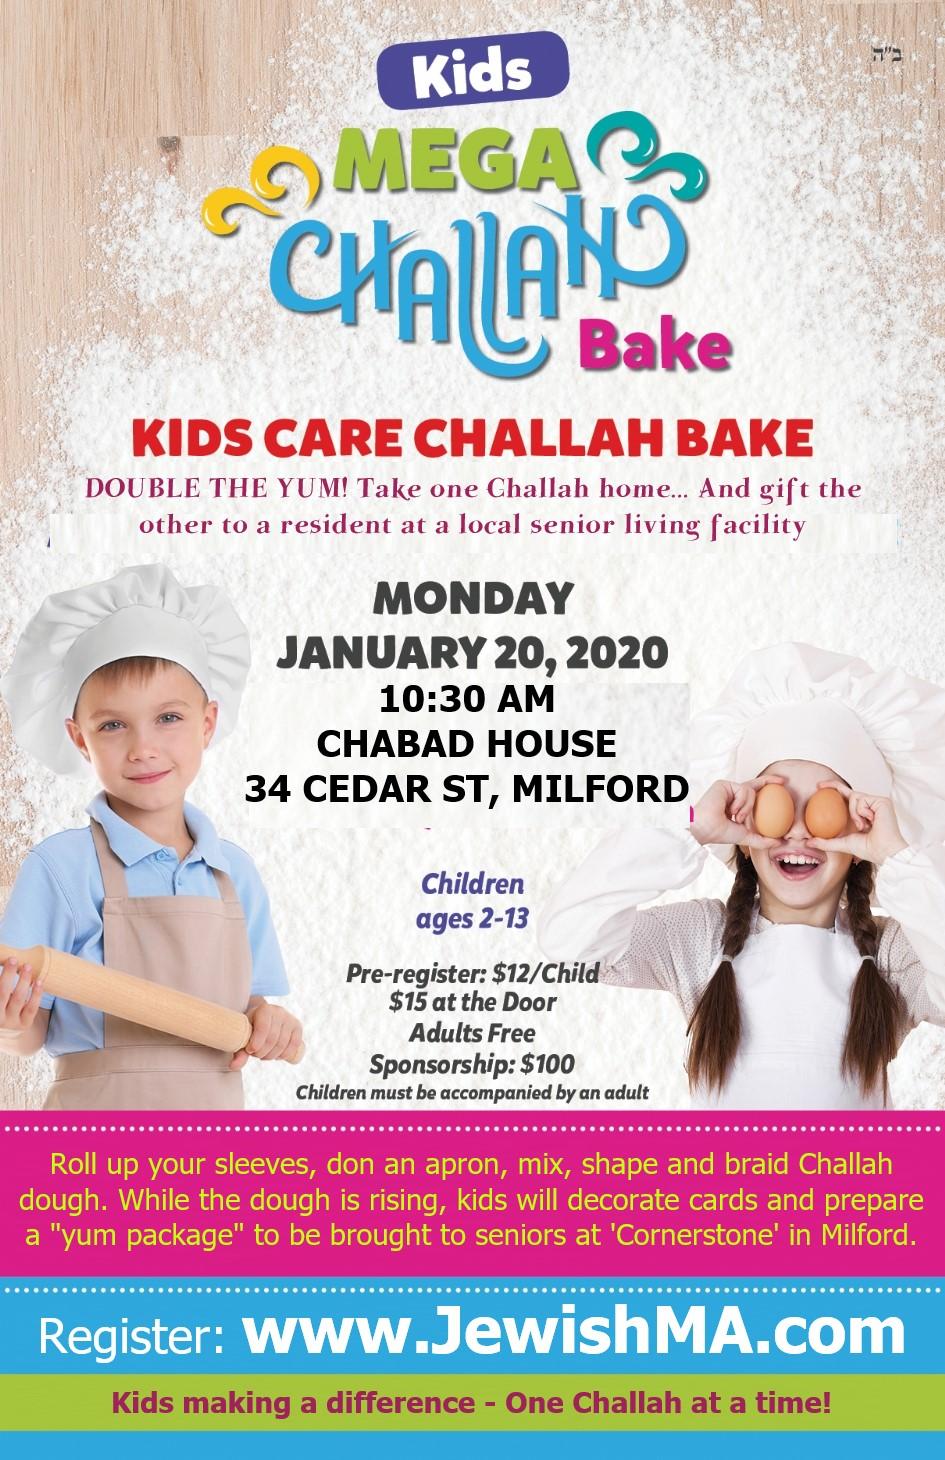 KidsChallah bake2020